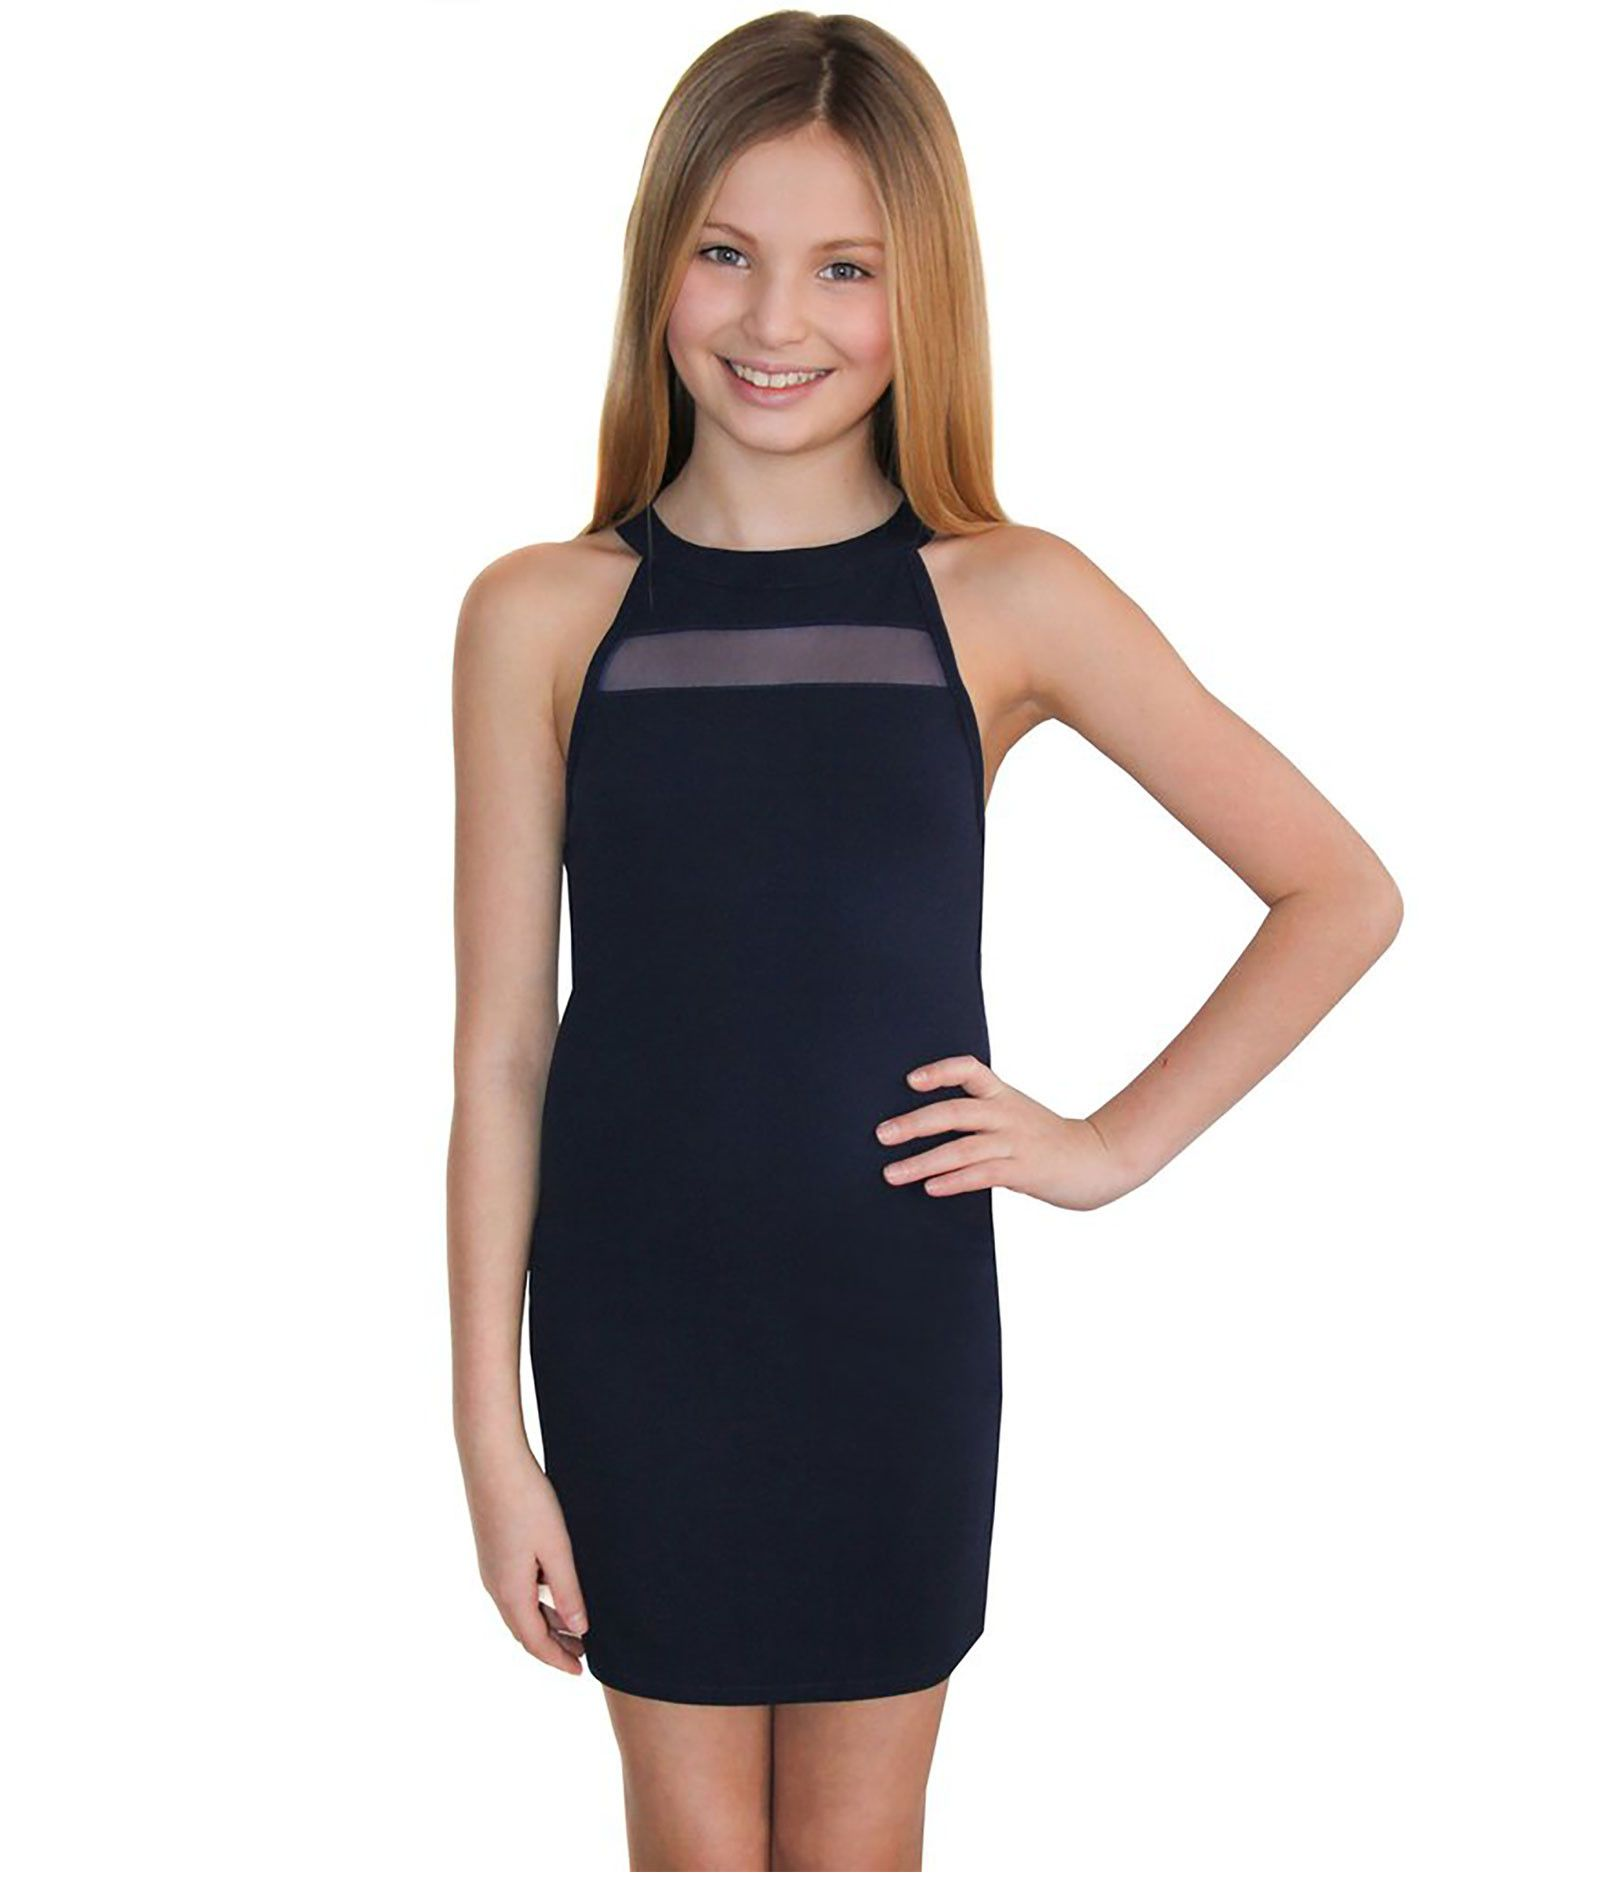 Girls Bodycon Dresses